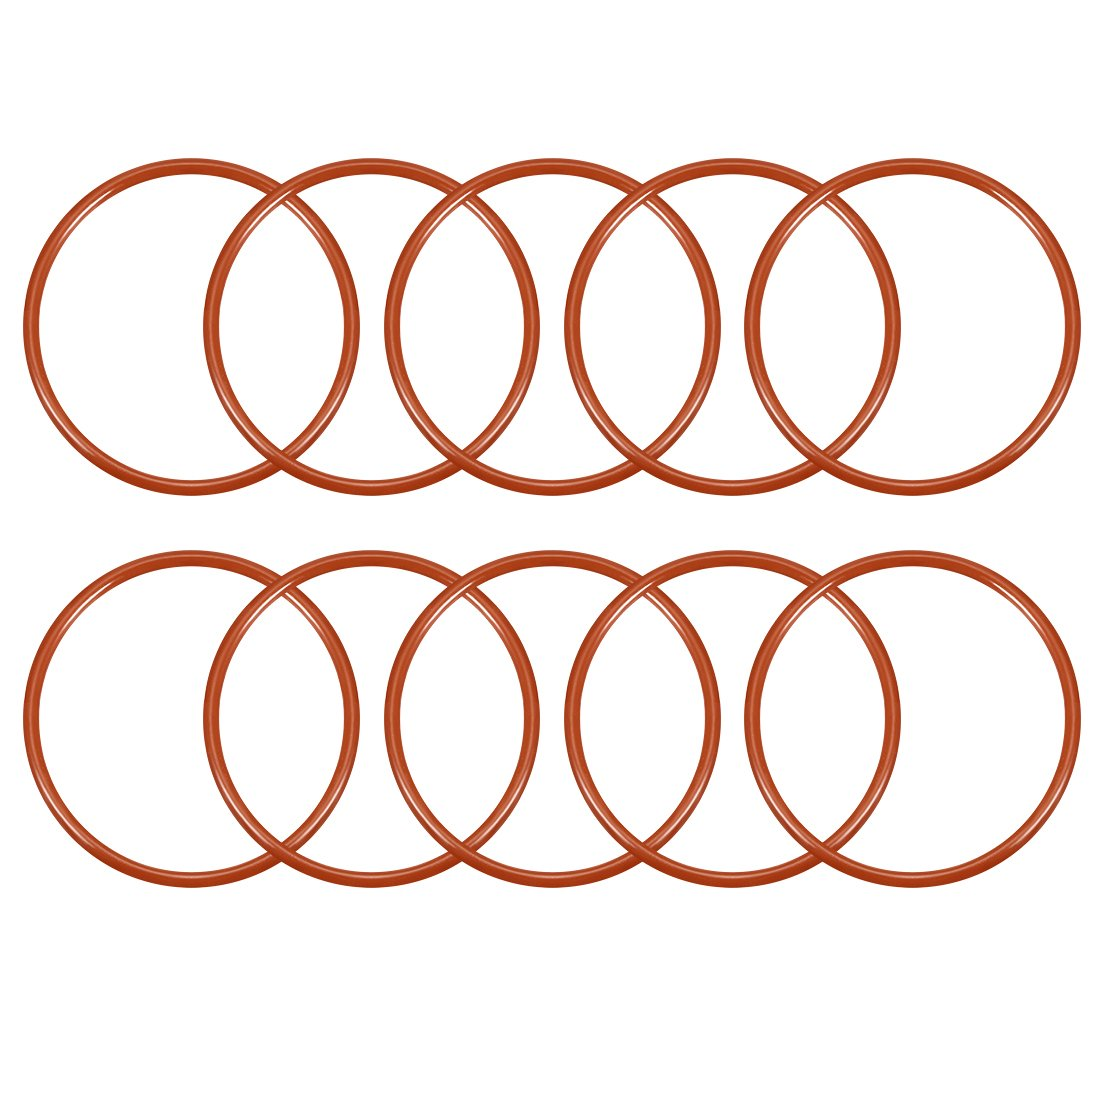 sourcing map 10pcs Silikon O-Ring 45mmx40,2mmx2,4mm VMQ Dichtring Dichtungsring Dichtung rot DE de